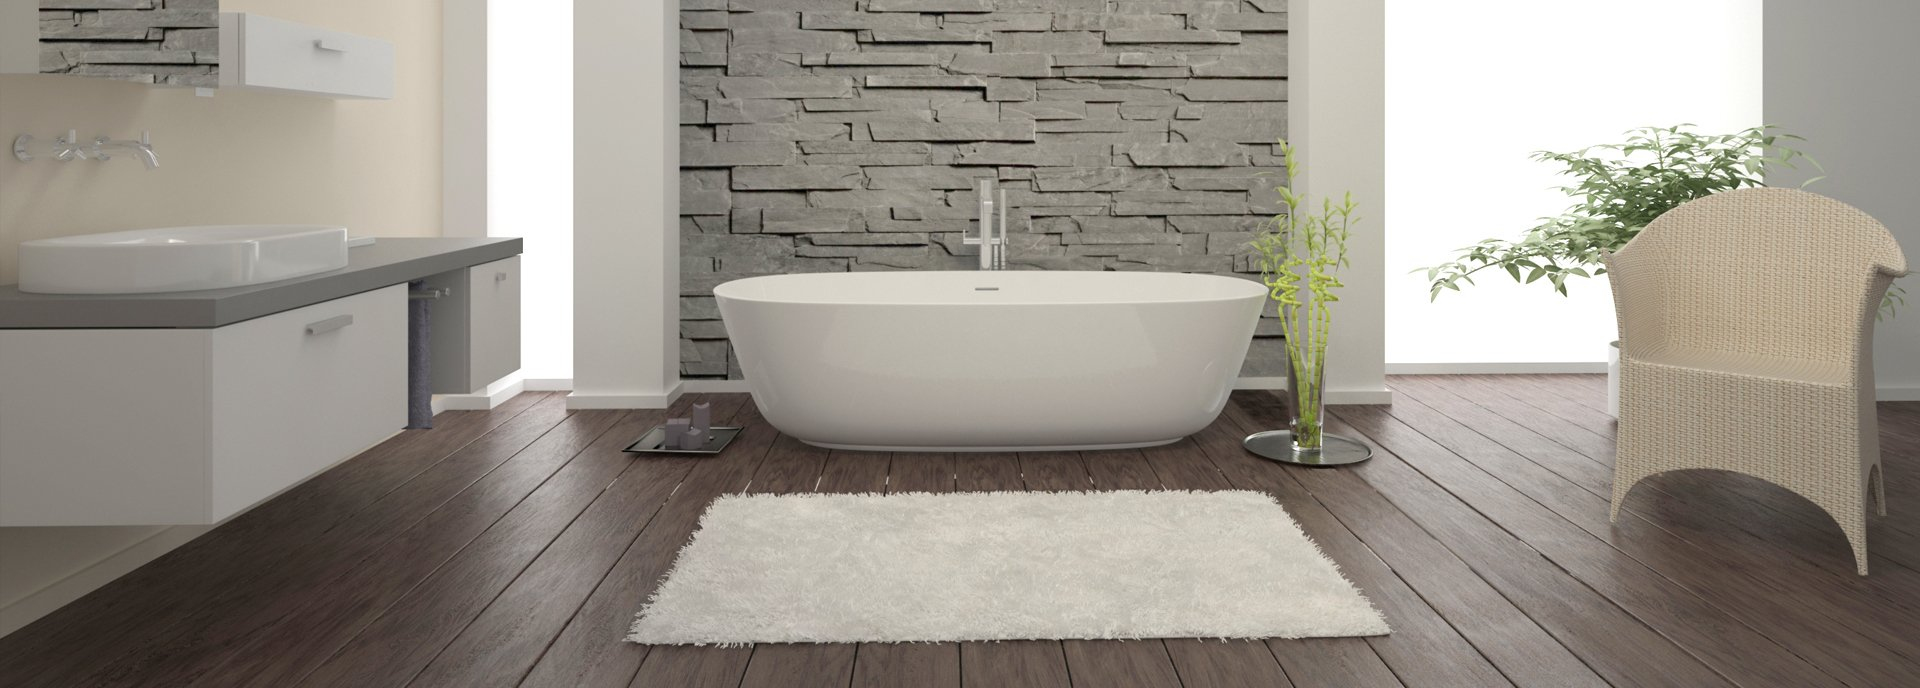 floor standing modern bath set against faux slate wall